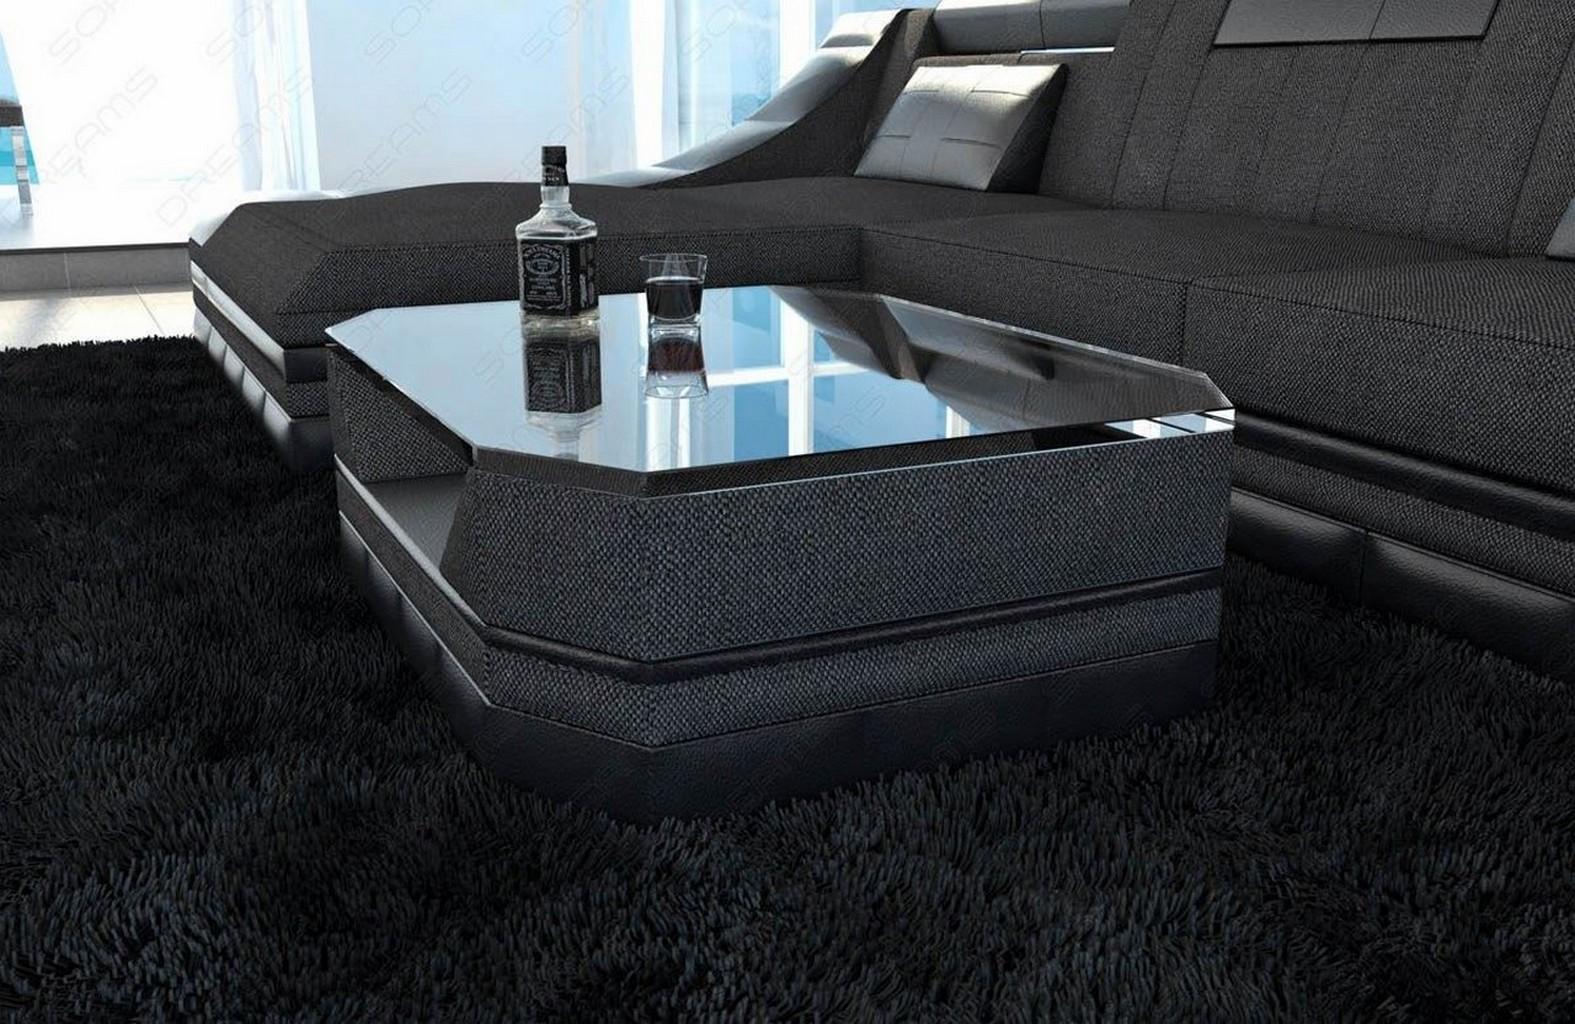 beistelltisch leder beistelltisch leder com forafrica. Black Bedroom Furniture Sets. Home Design Ideas